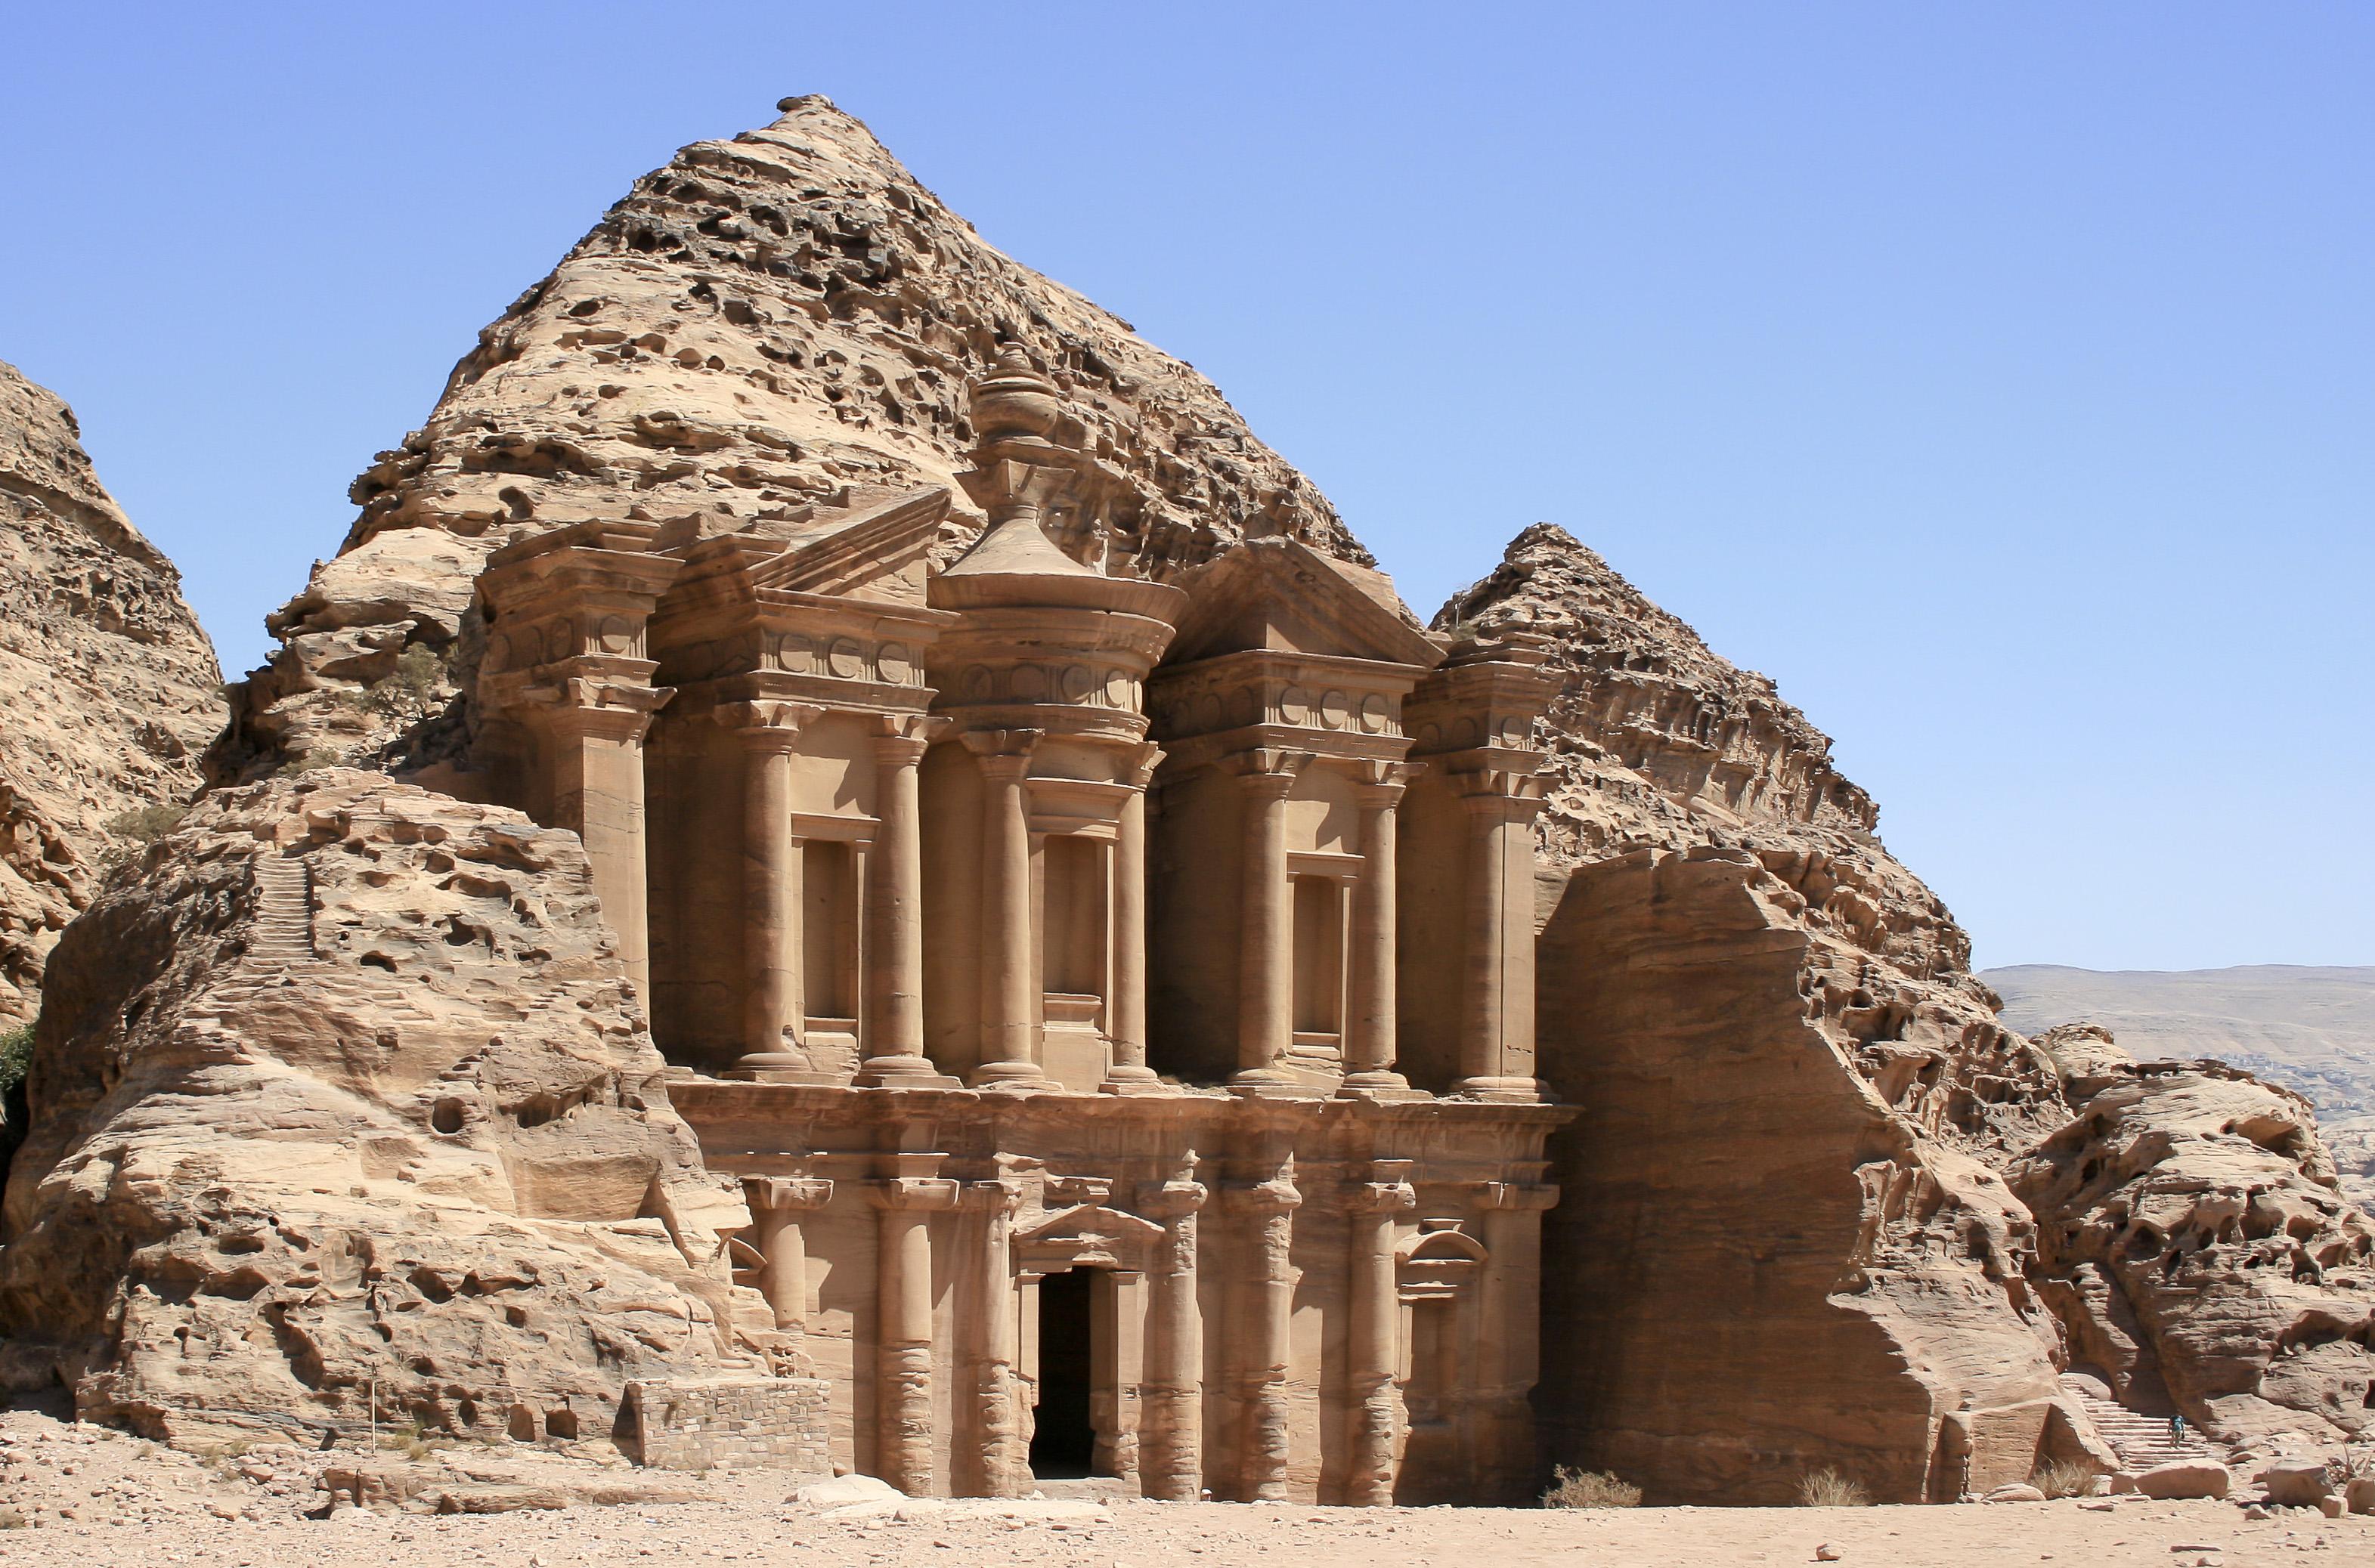 nike 72 t-shirt - Petra - Wikipedia, the free encyclopedia